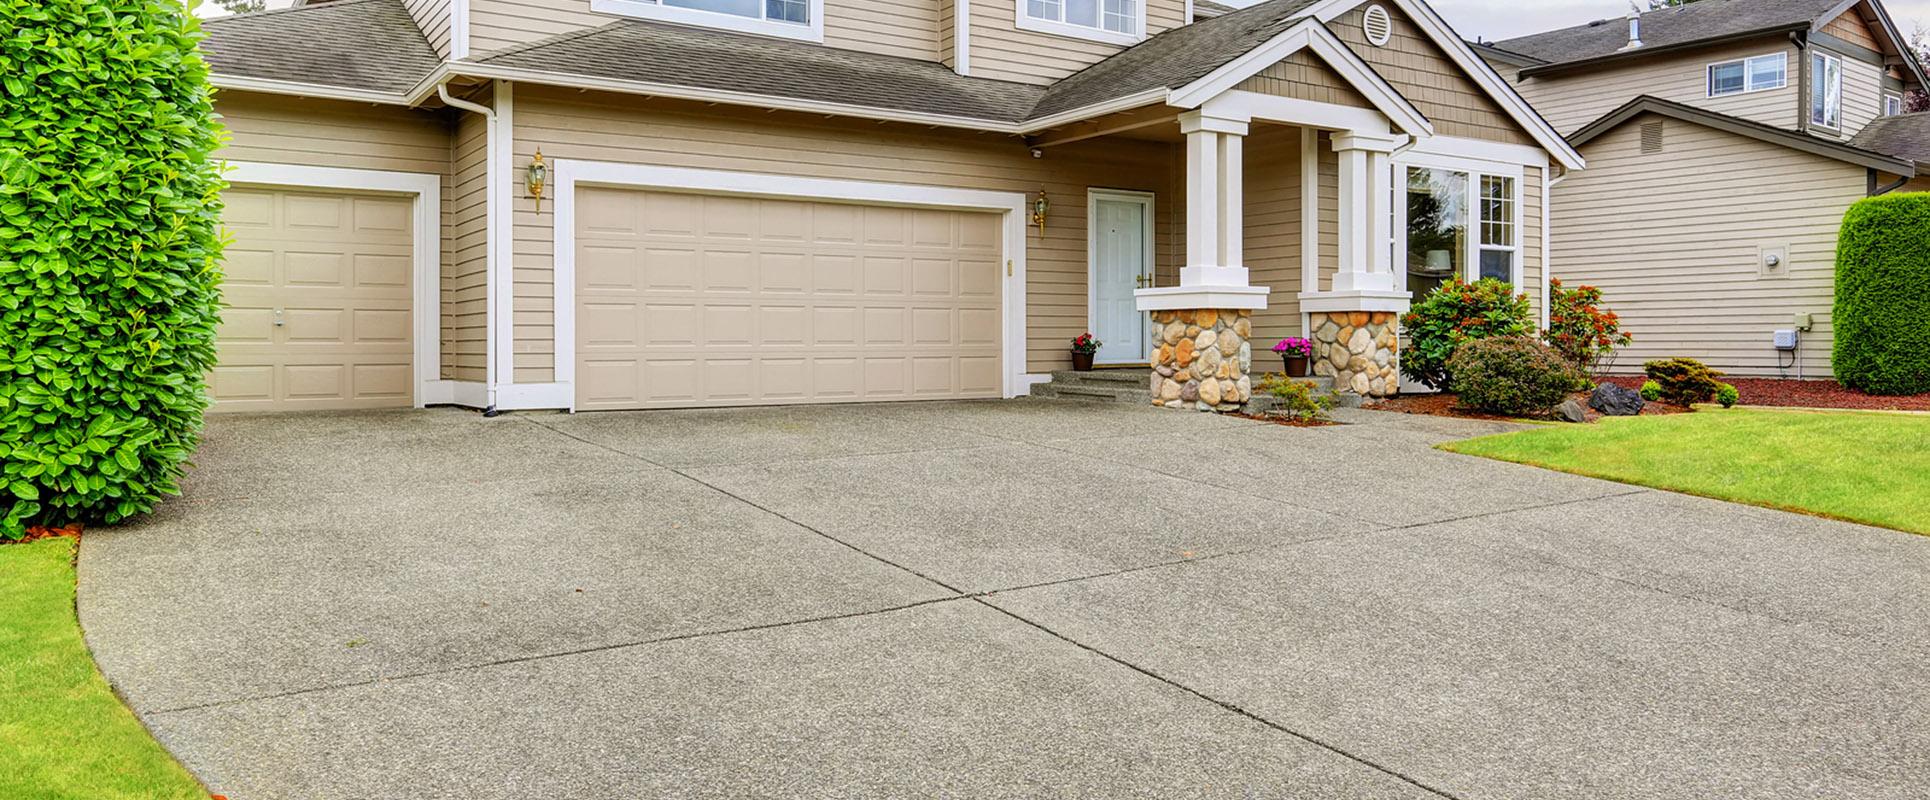 Concrete Slab Jacking at Residential Properties & Driveways